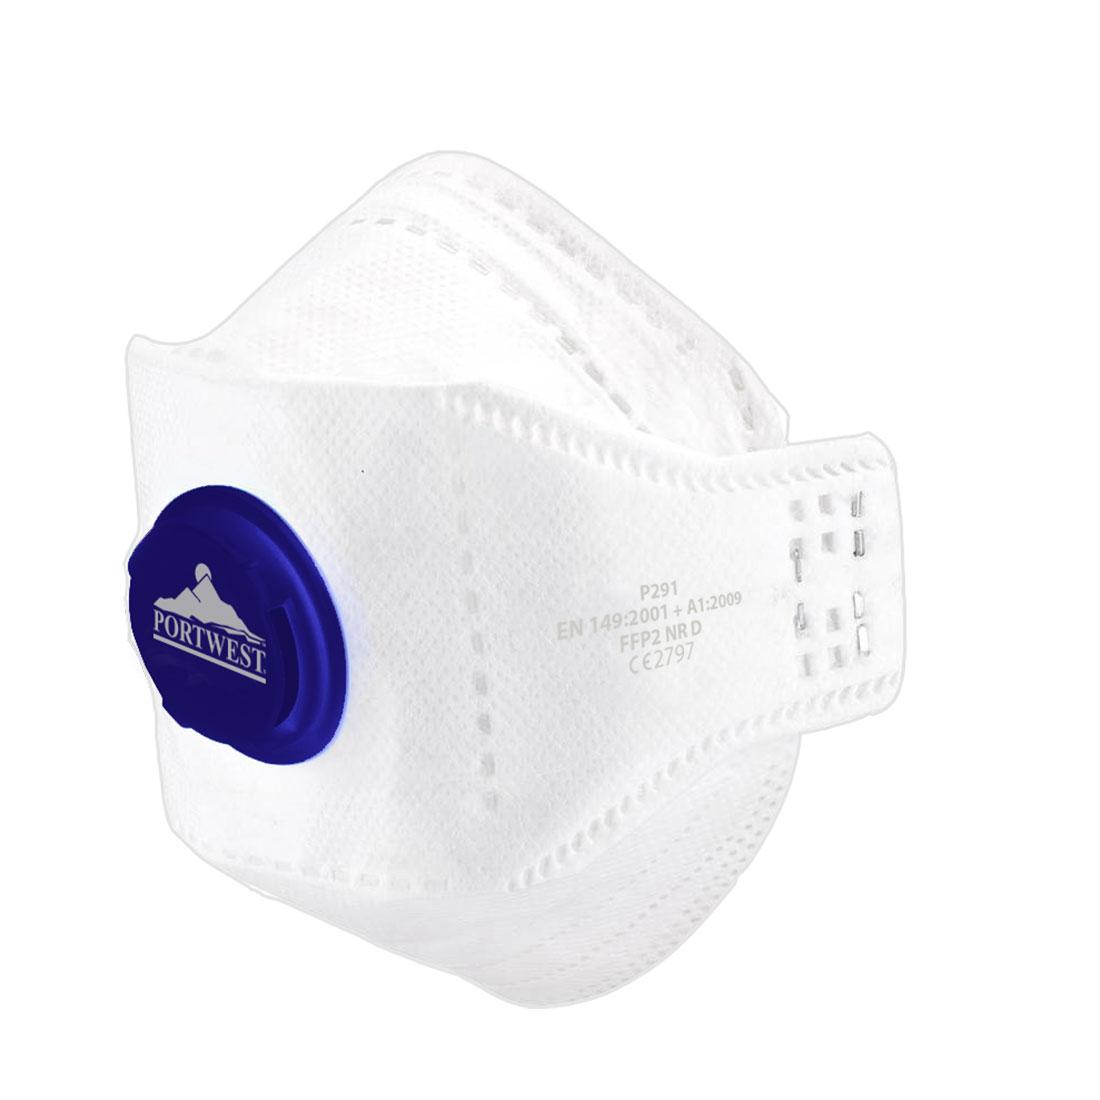 Portwest Valved Dolomite Fold Respirator